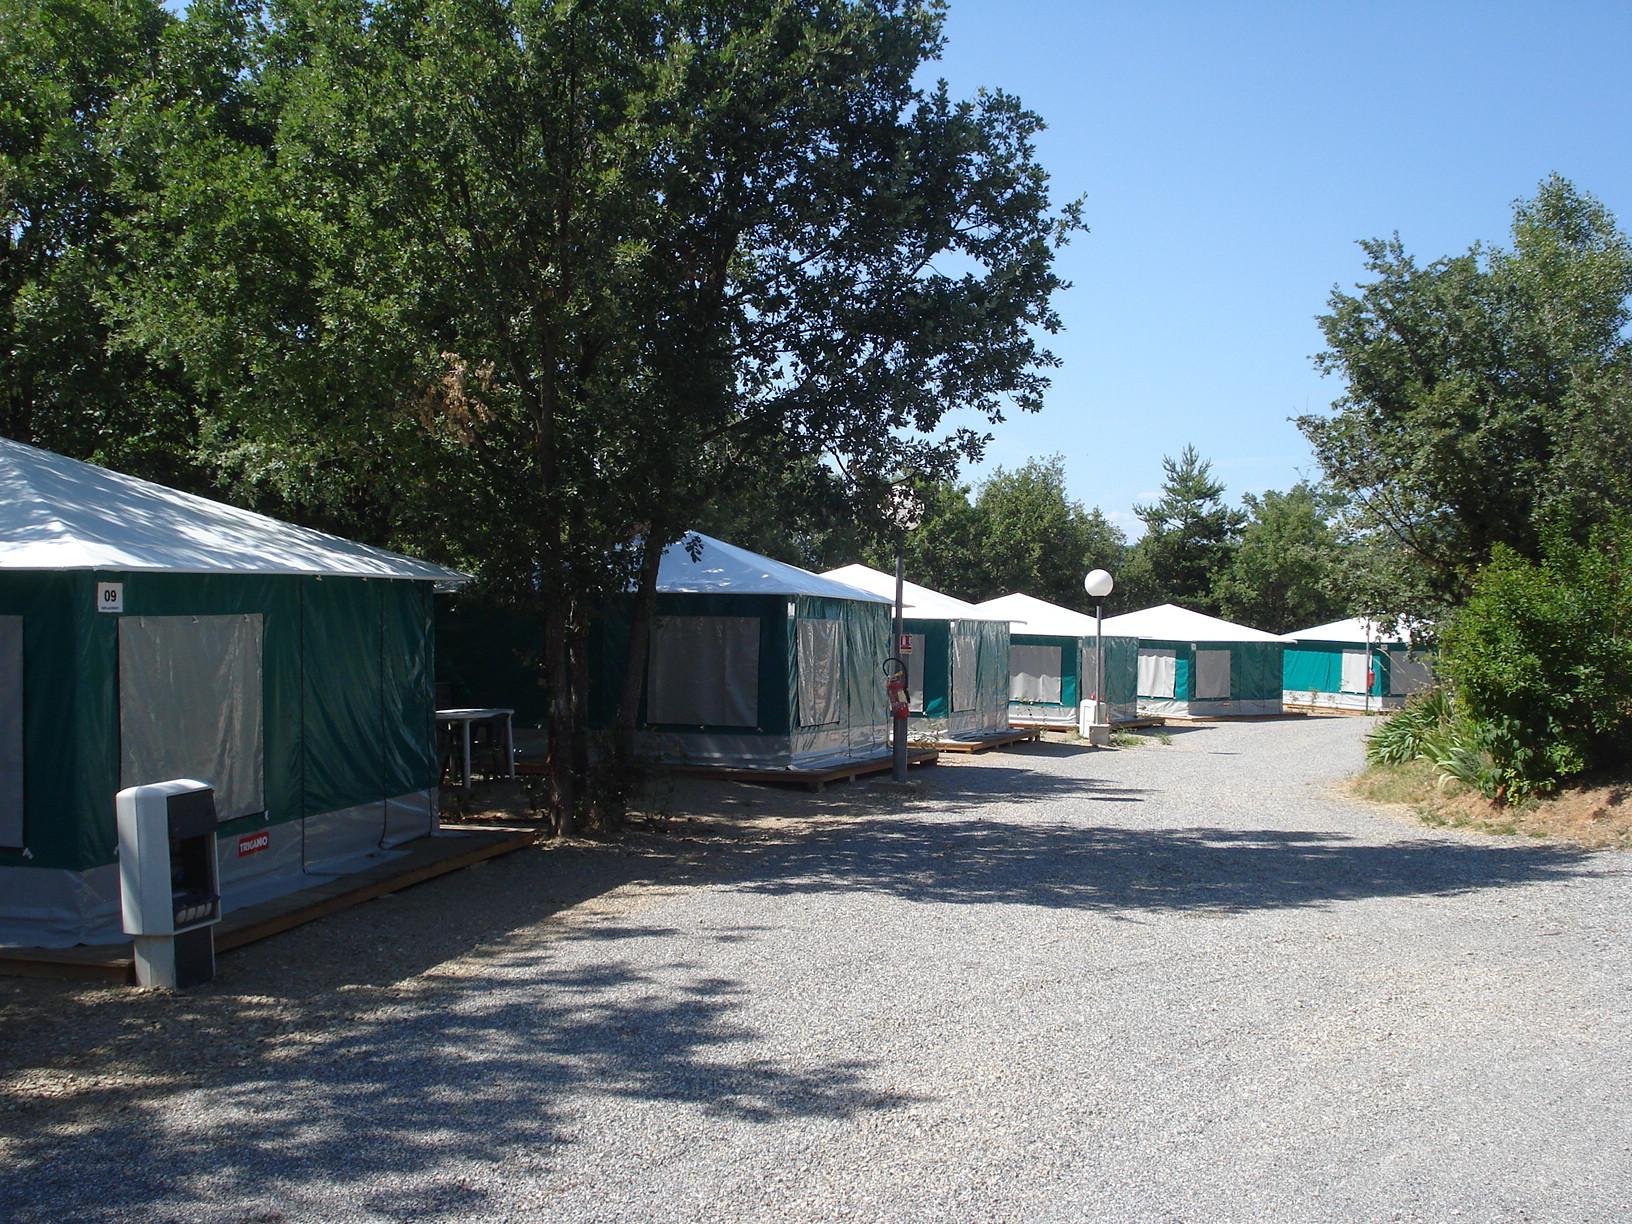 Camping Le Lac à Bauduen - Hébergement 4